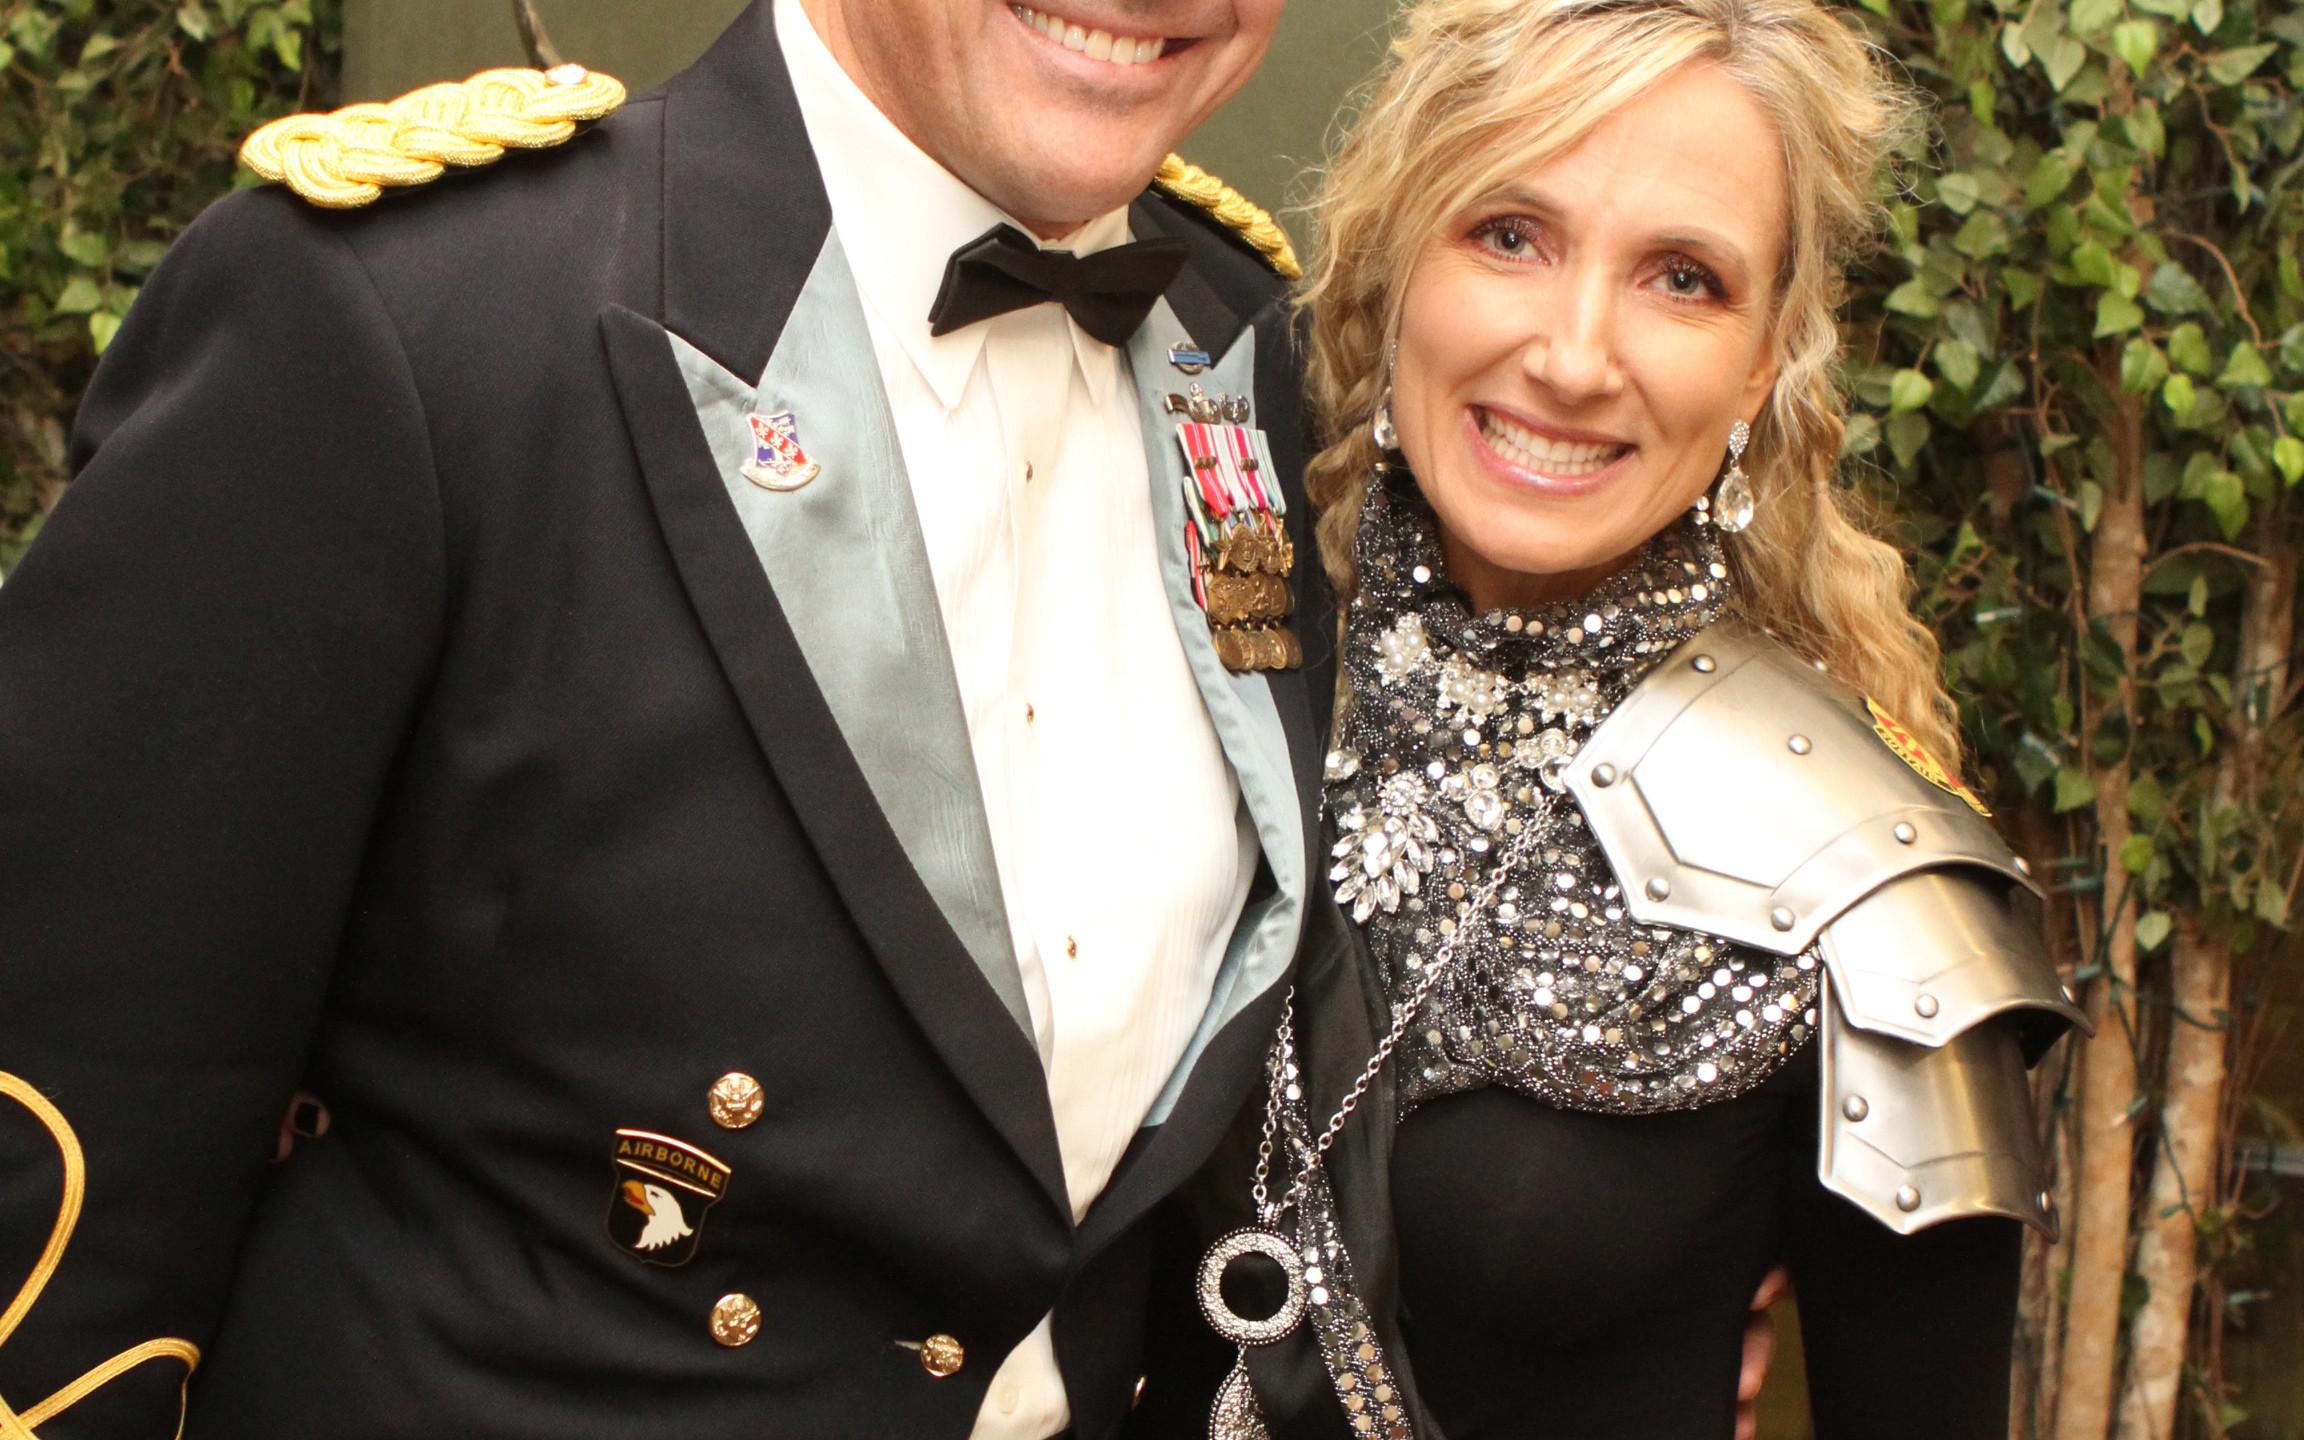 Colonel Joe & Sarah Kuchan